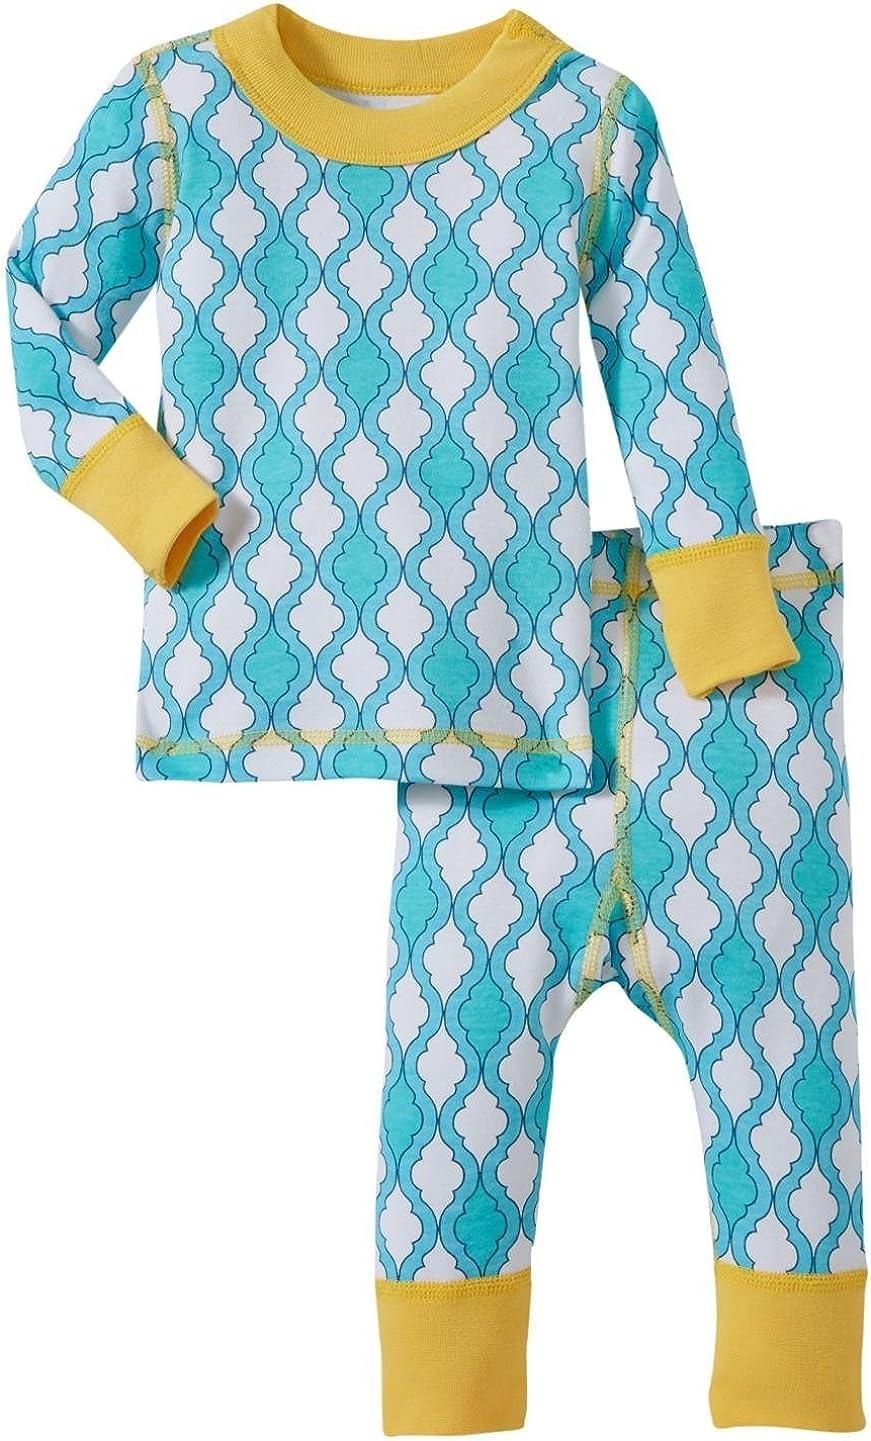 Masala Baby Girls' Jiva PJ Set (Baby) - Turquoise/Yellow - 6-12 Months